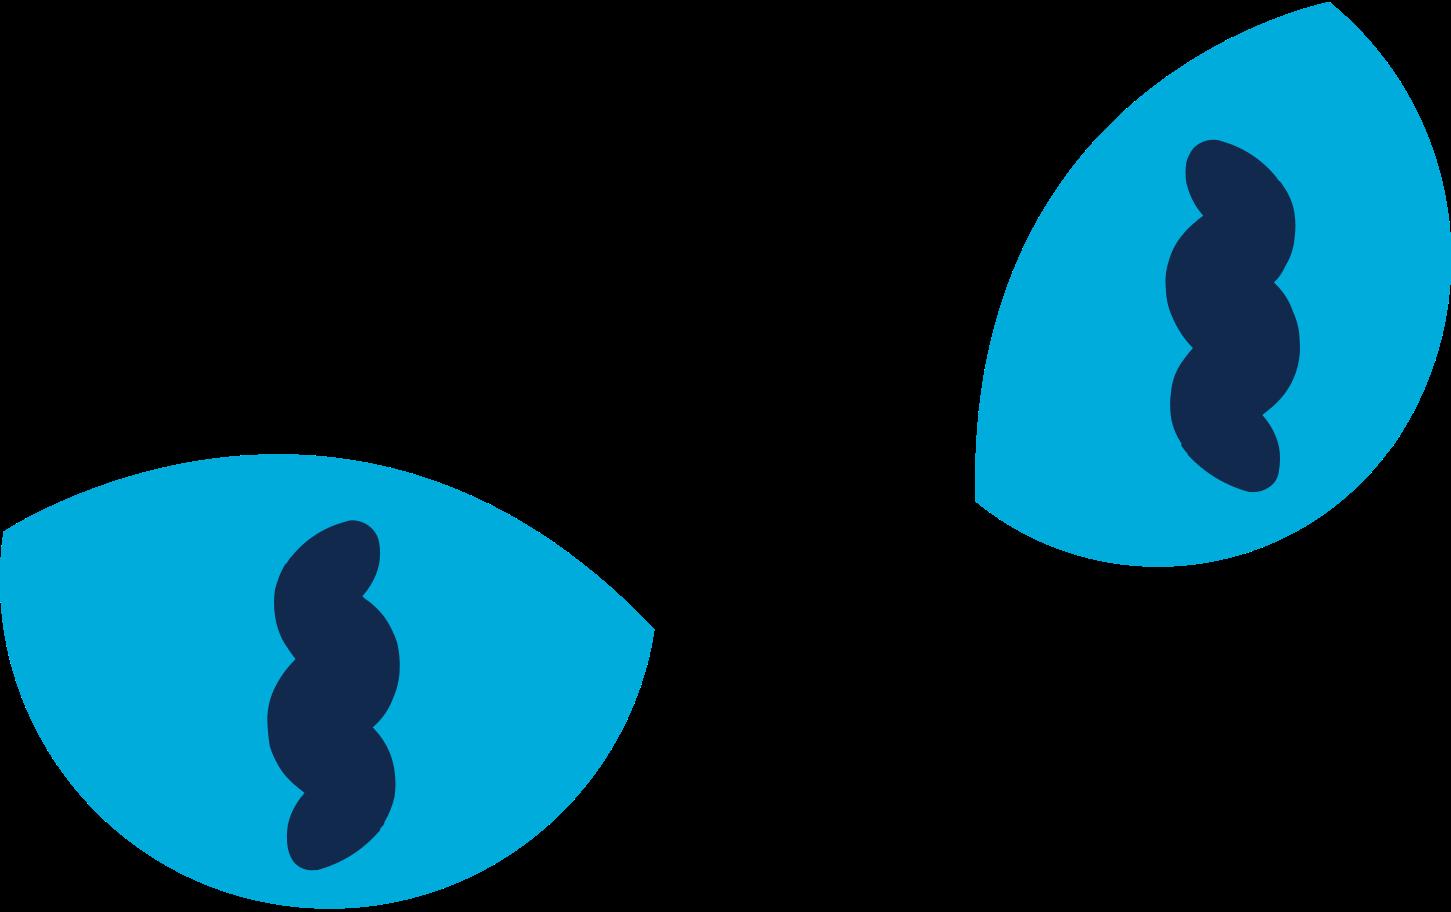 cat eyes Clipart illustration in PNG, SVG